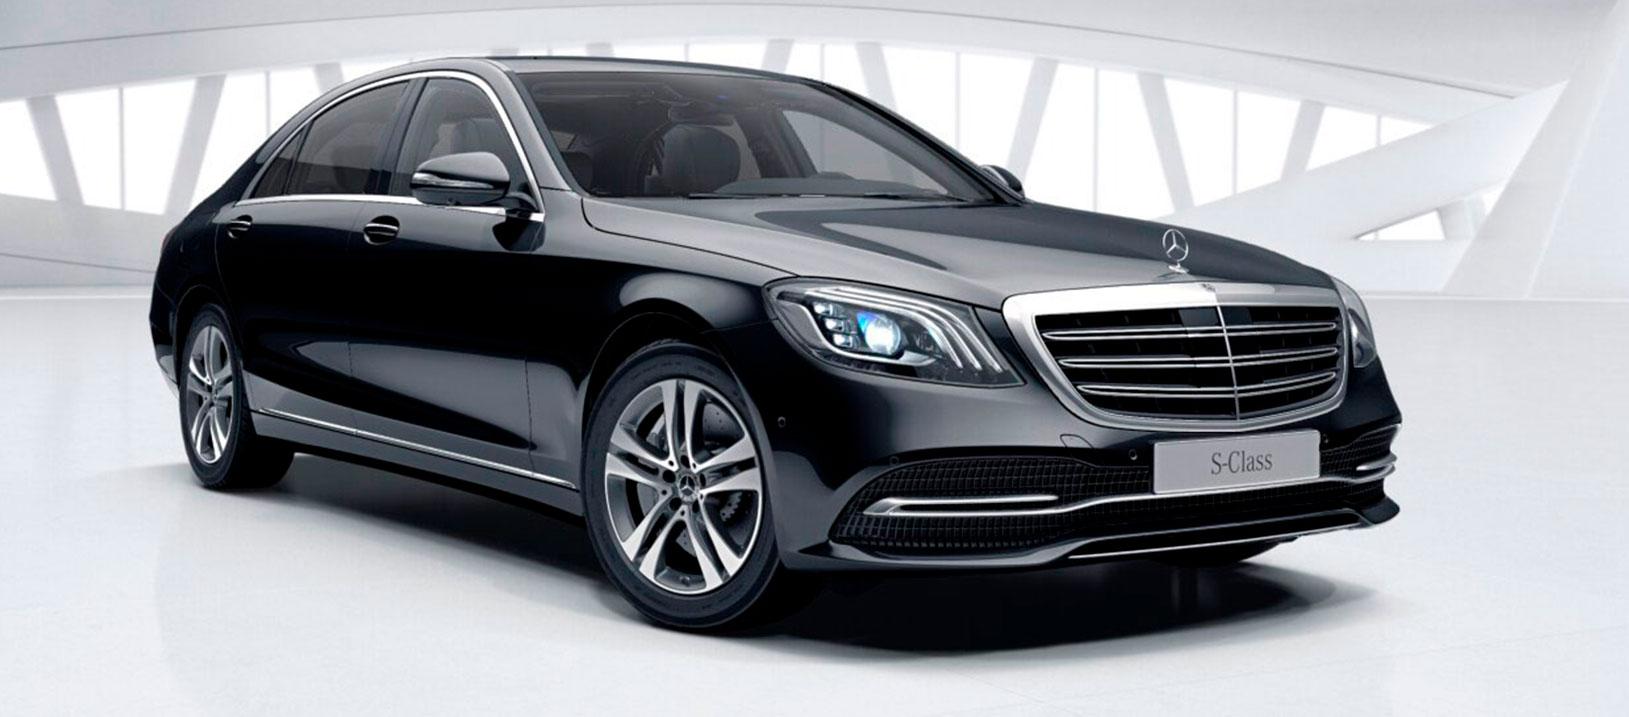 Mercedes-Benz S 350 d 4MATIC long 52600220